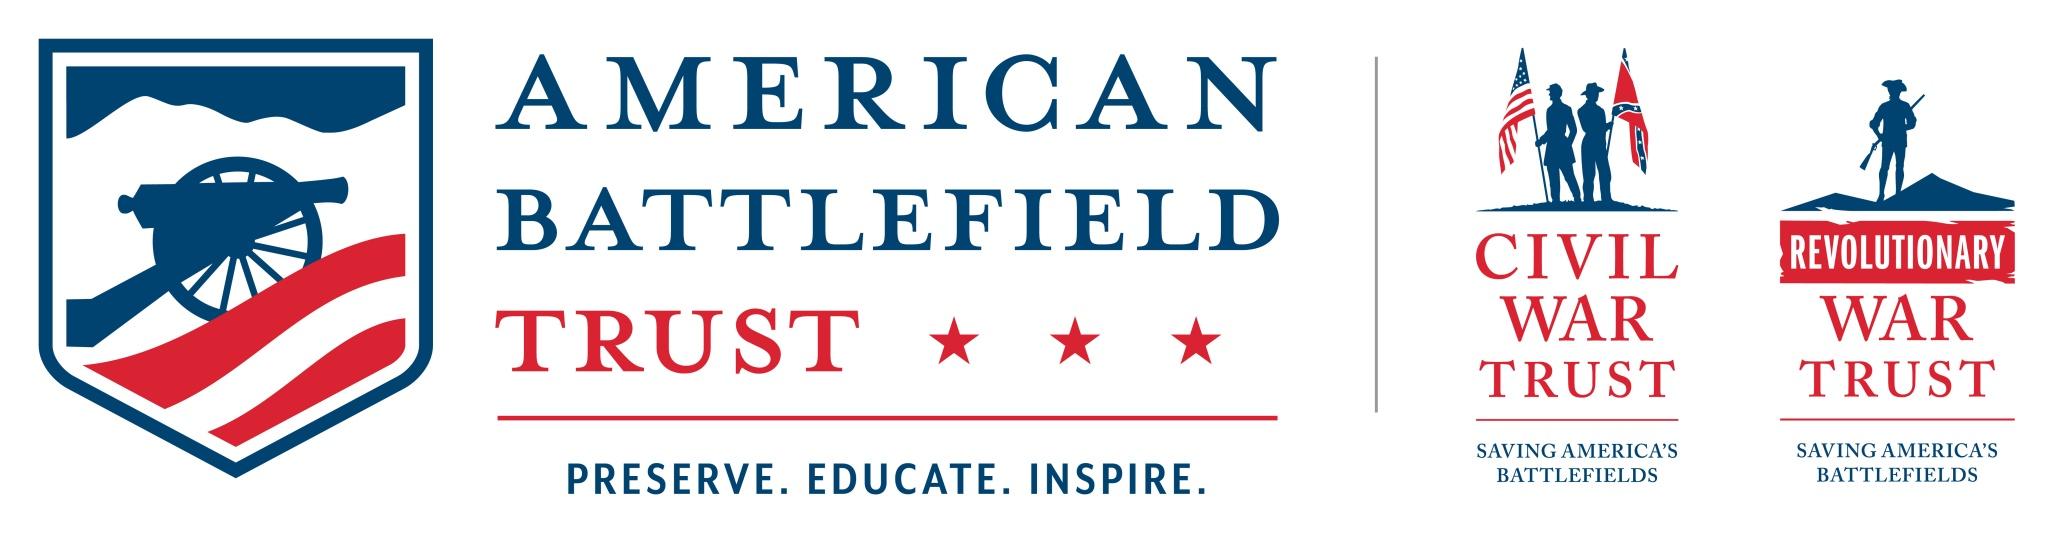 american-battlefield-trust-umbrella-logos[7738]